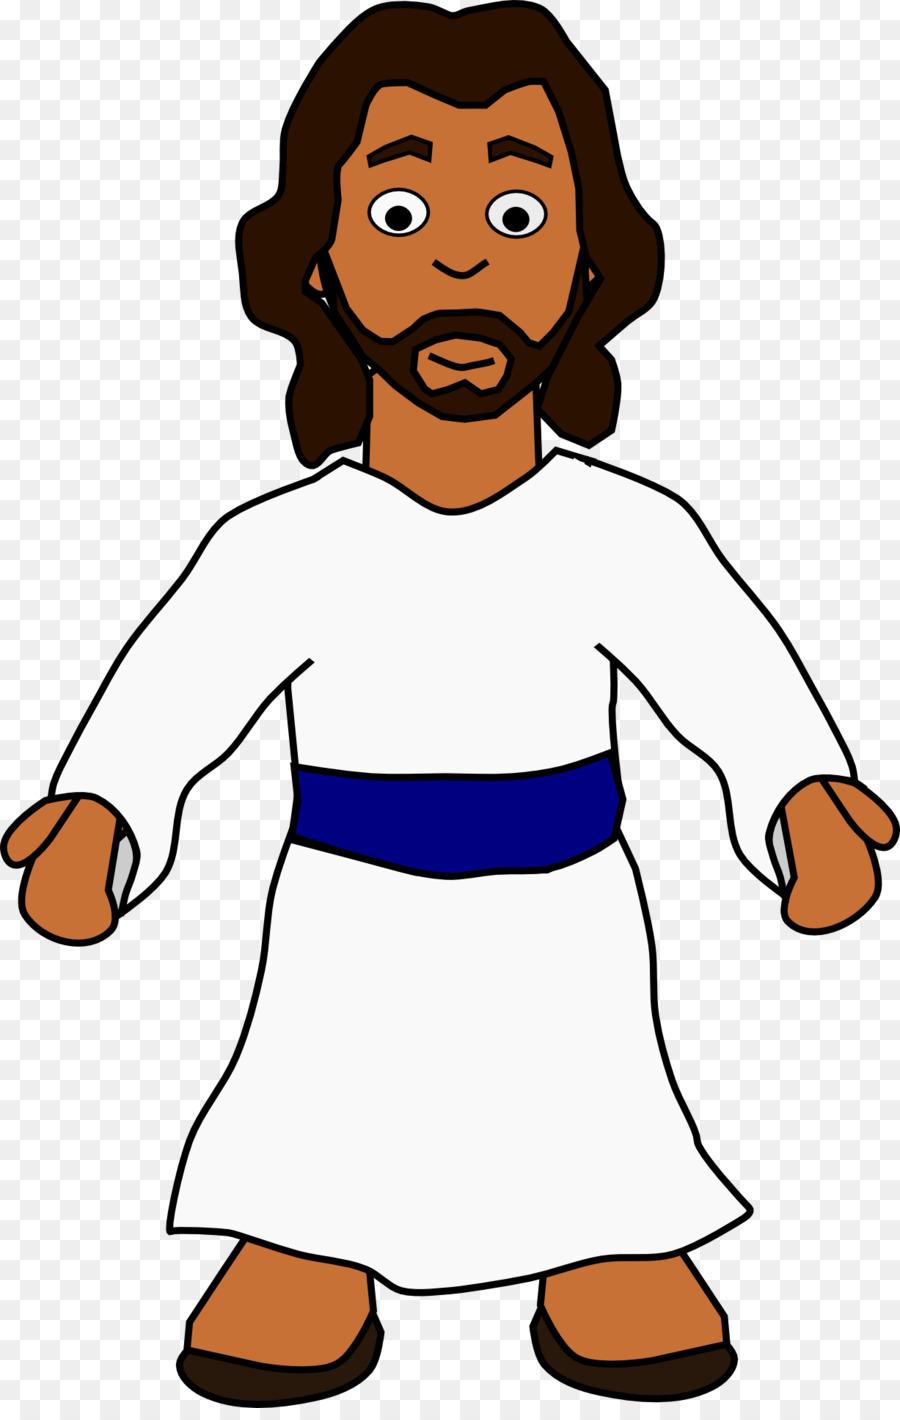 depiction of jesus cartoon clip art jesus png download 1227 1920 rh kisspng com Jesus Face Clip Art Angel Clip Art